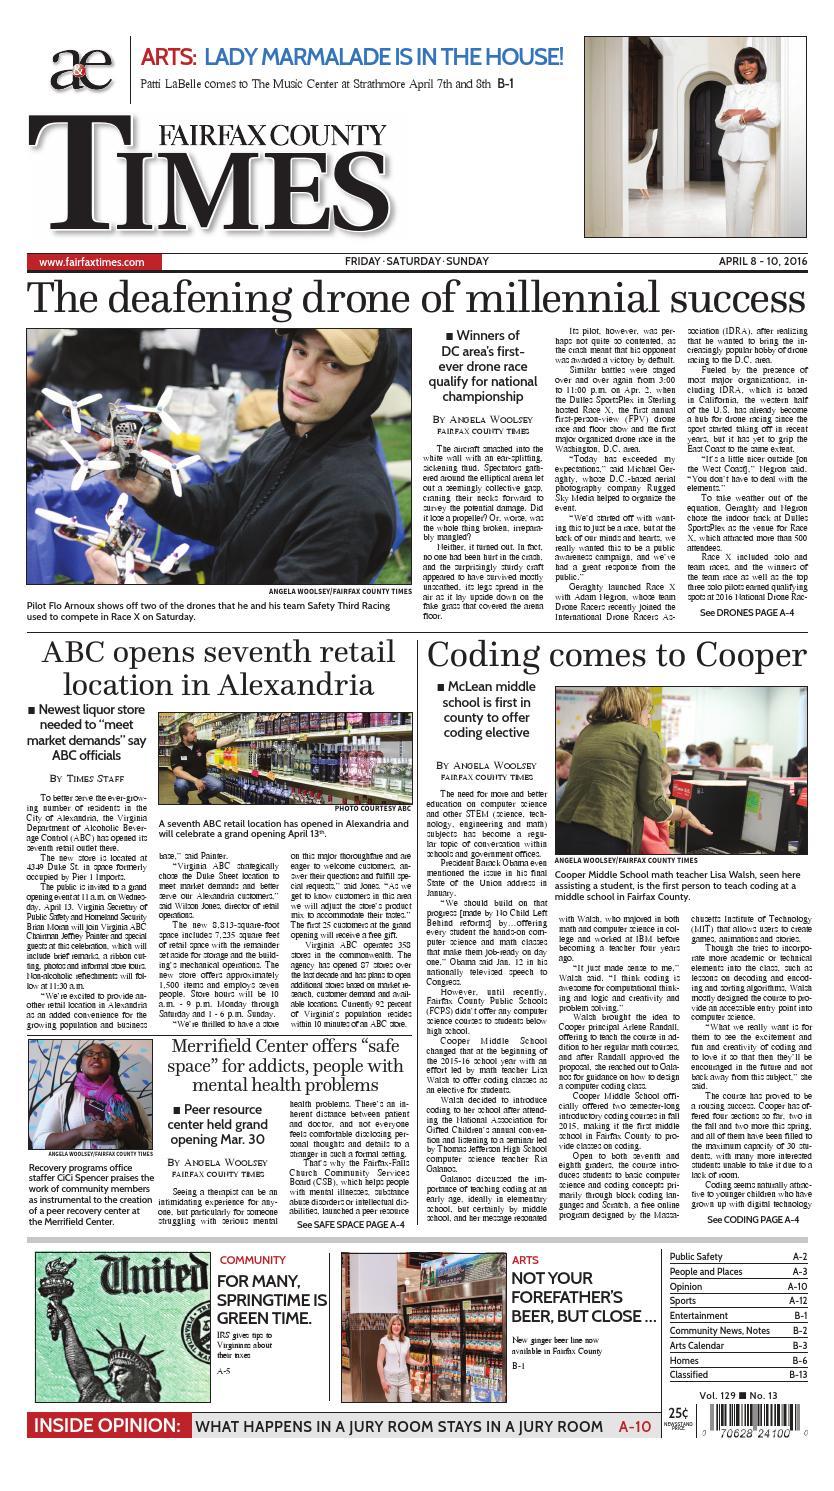 Fairfax County Times 04-08-16 Edition by The Fairfax Times - issuu